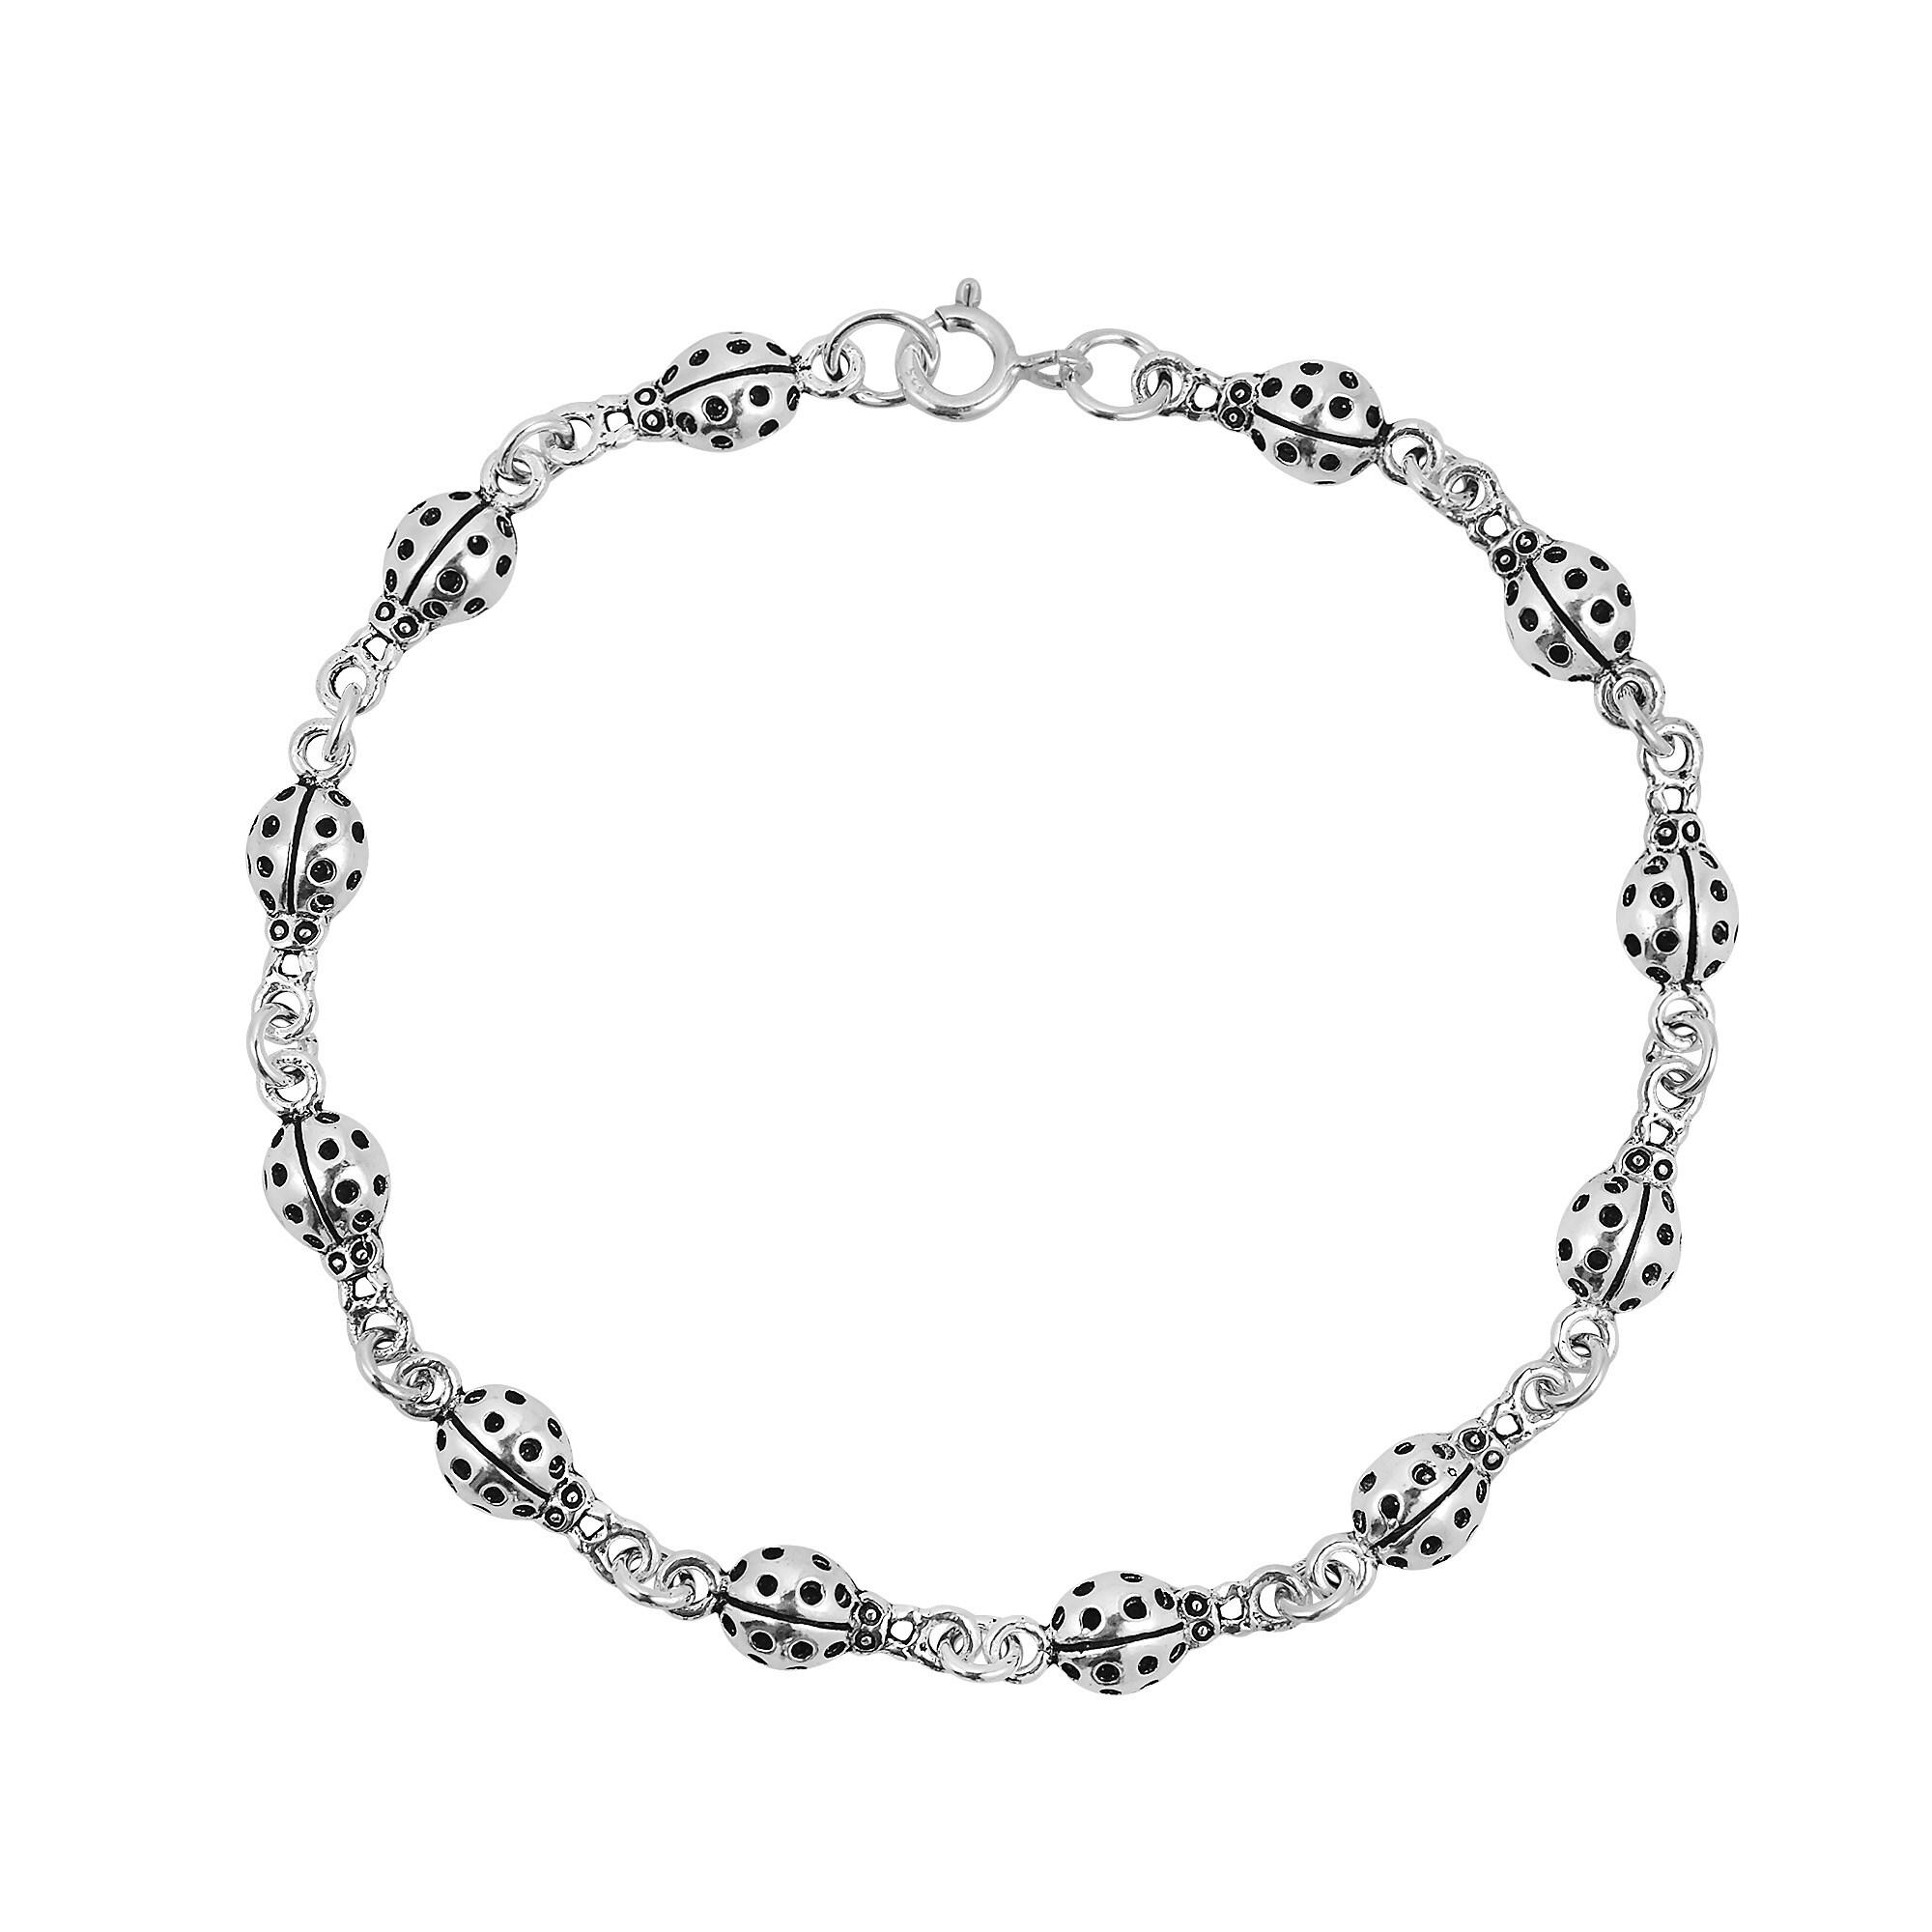 Unique Design Red Coral Sterling Silver Overlay 14 Grams Bangle//Bracelet Free Size